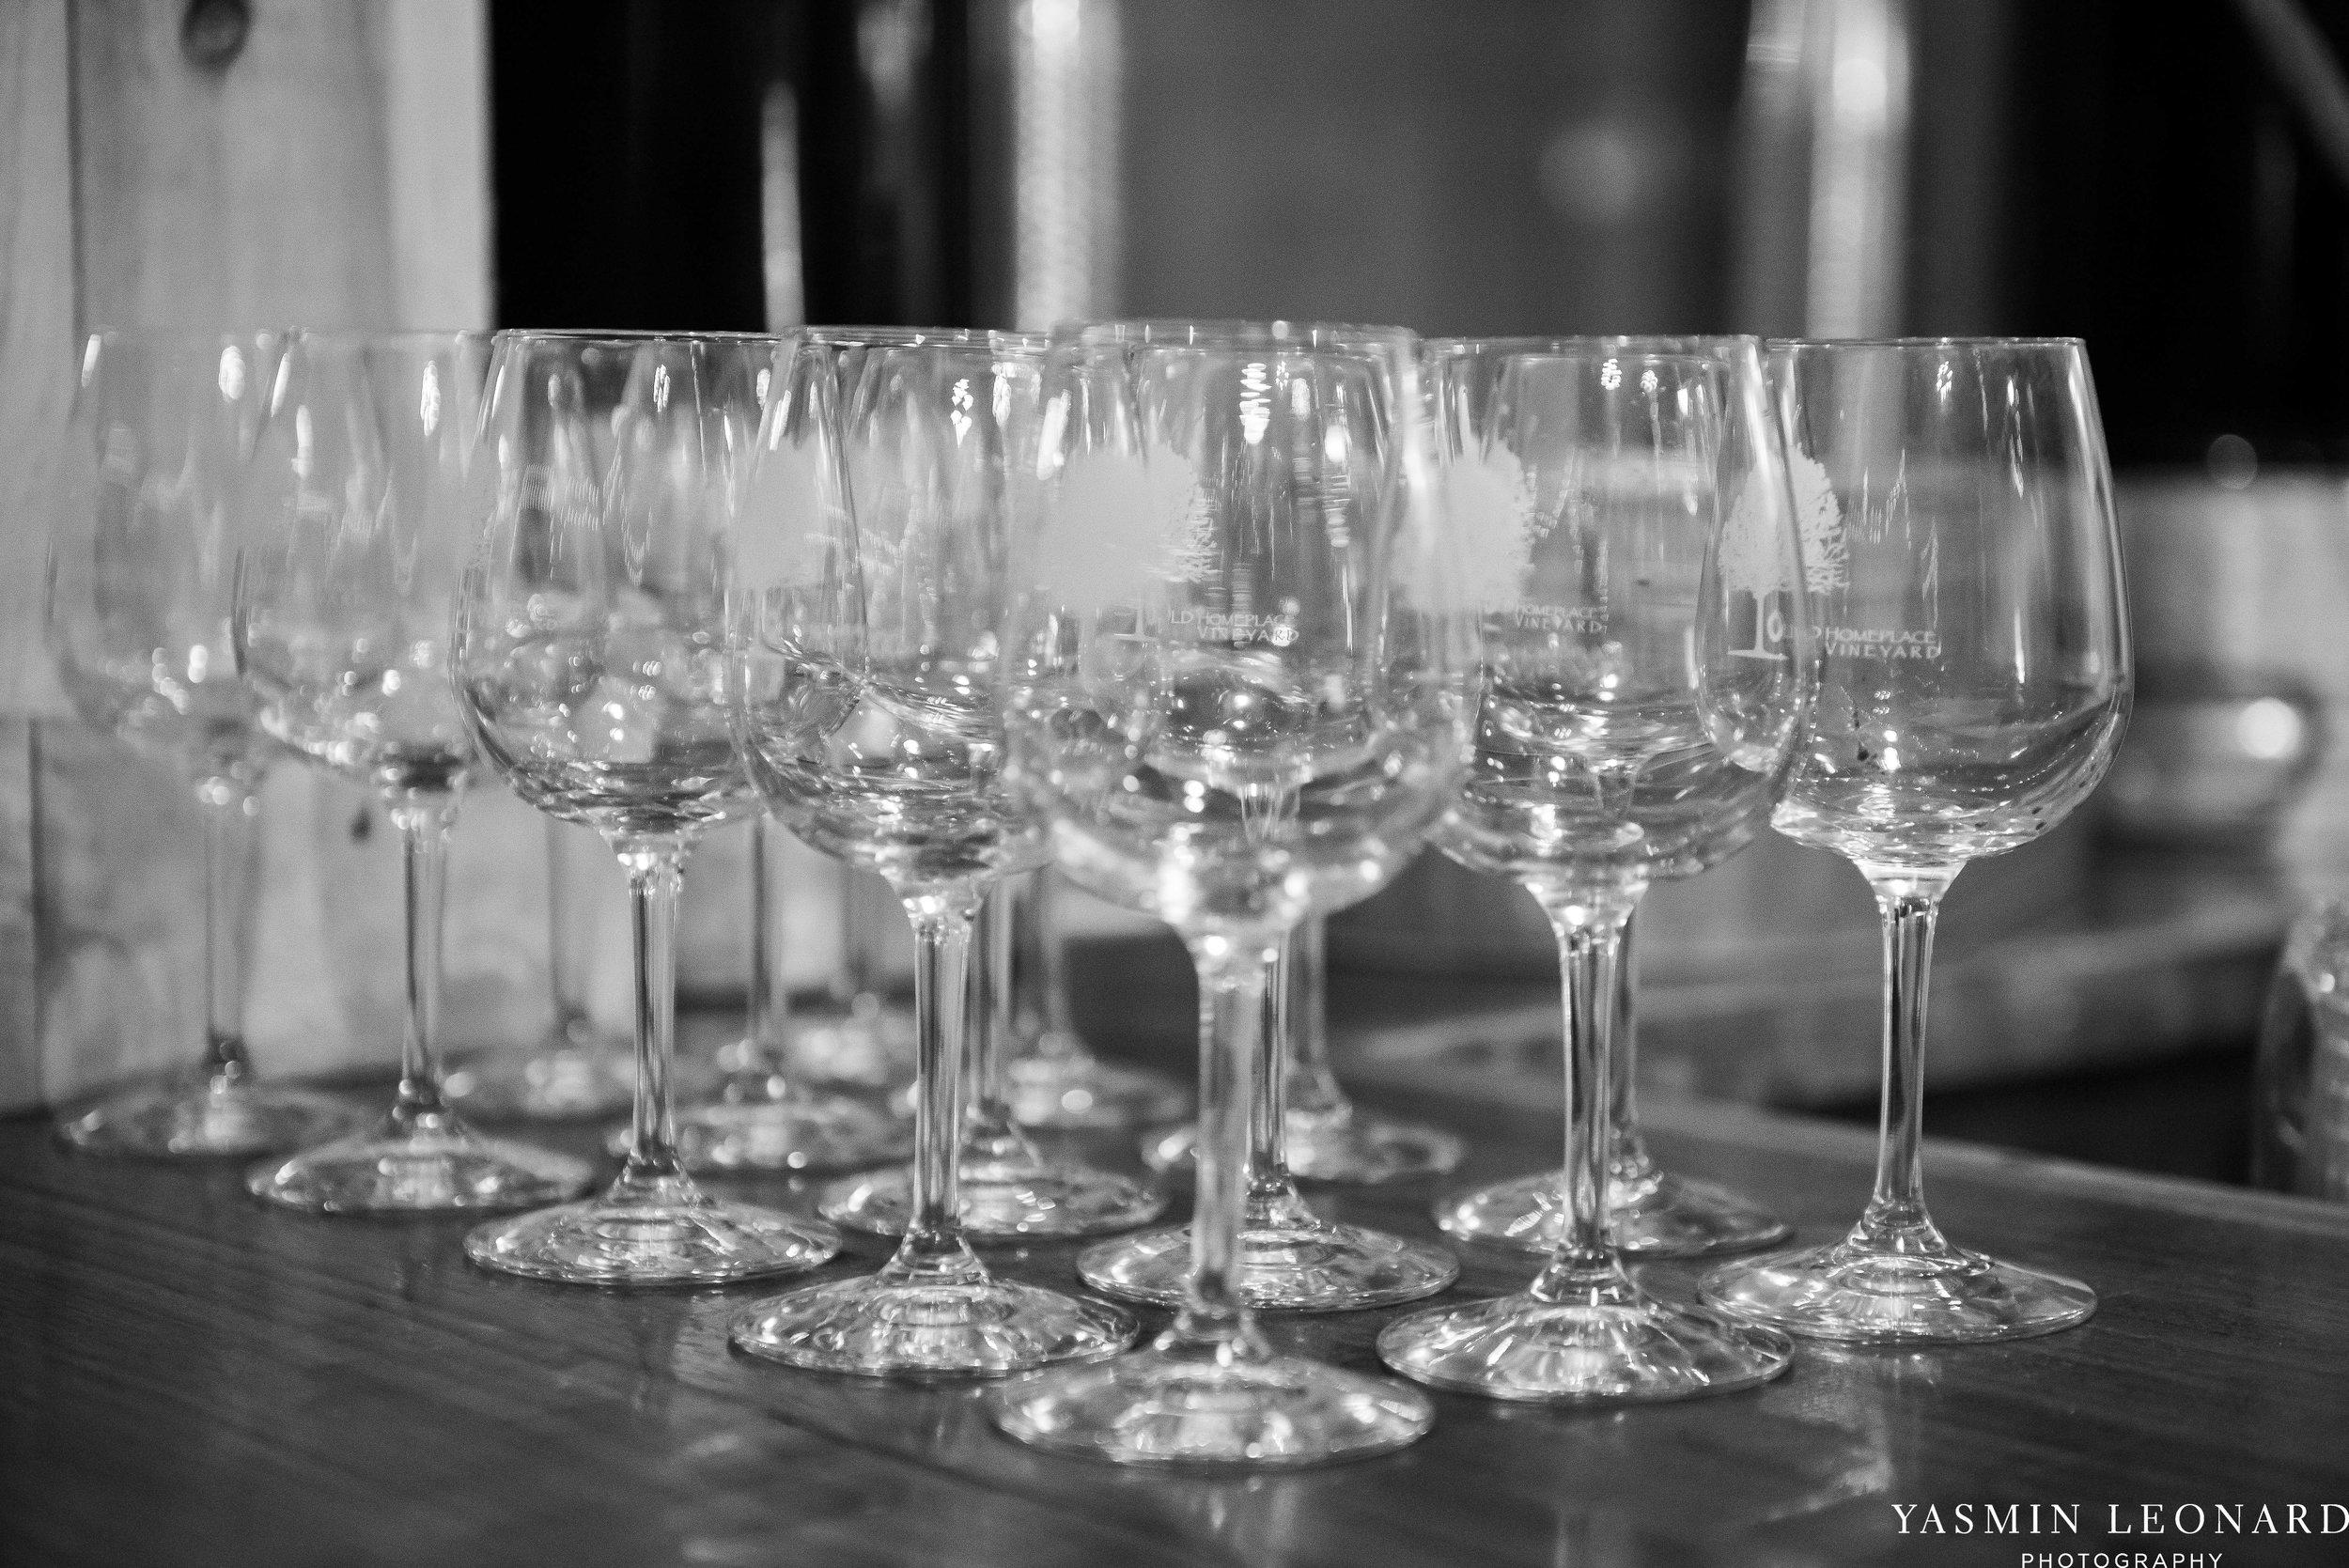 Old Homeplace Vineyard - NC Weddings - Outdoor Summer Weddings - Peony Boutique - Vineyard Wedding - NC Photographer - Yasmin Leonard Photography-7.jpg